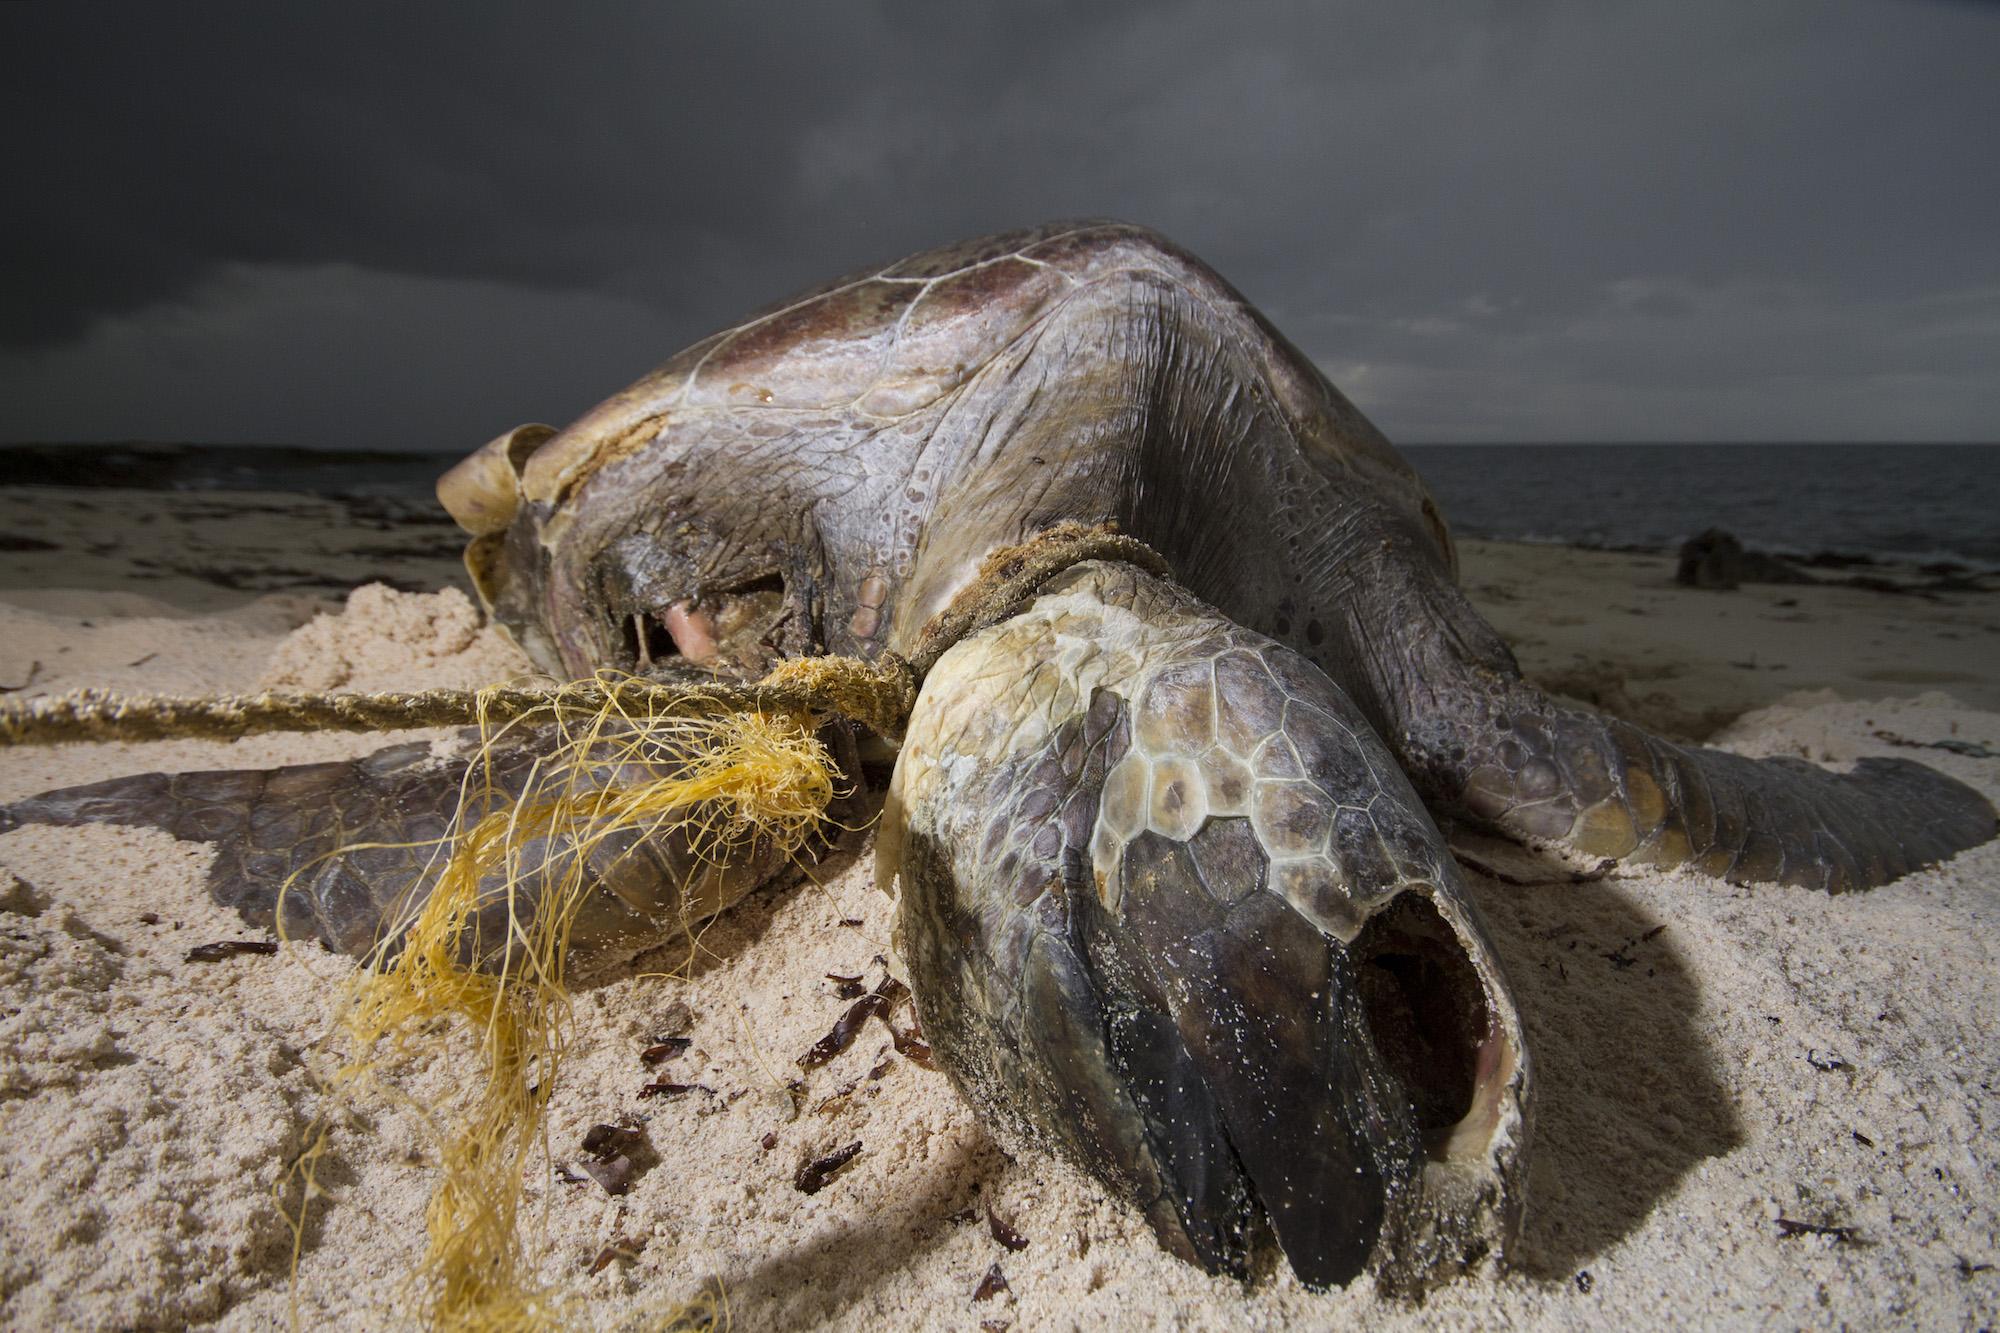 European tuna boats dump fishing debris in Seychelles waters 'with impunity'